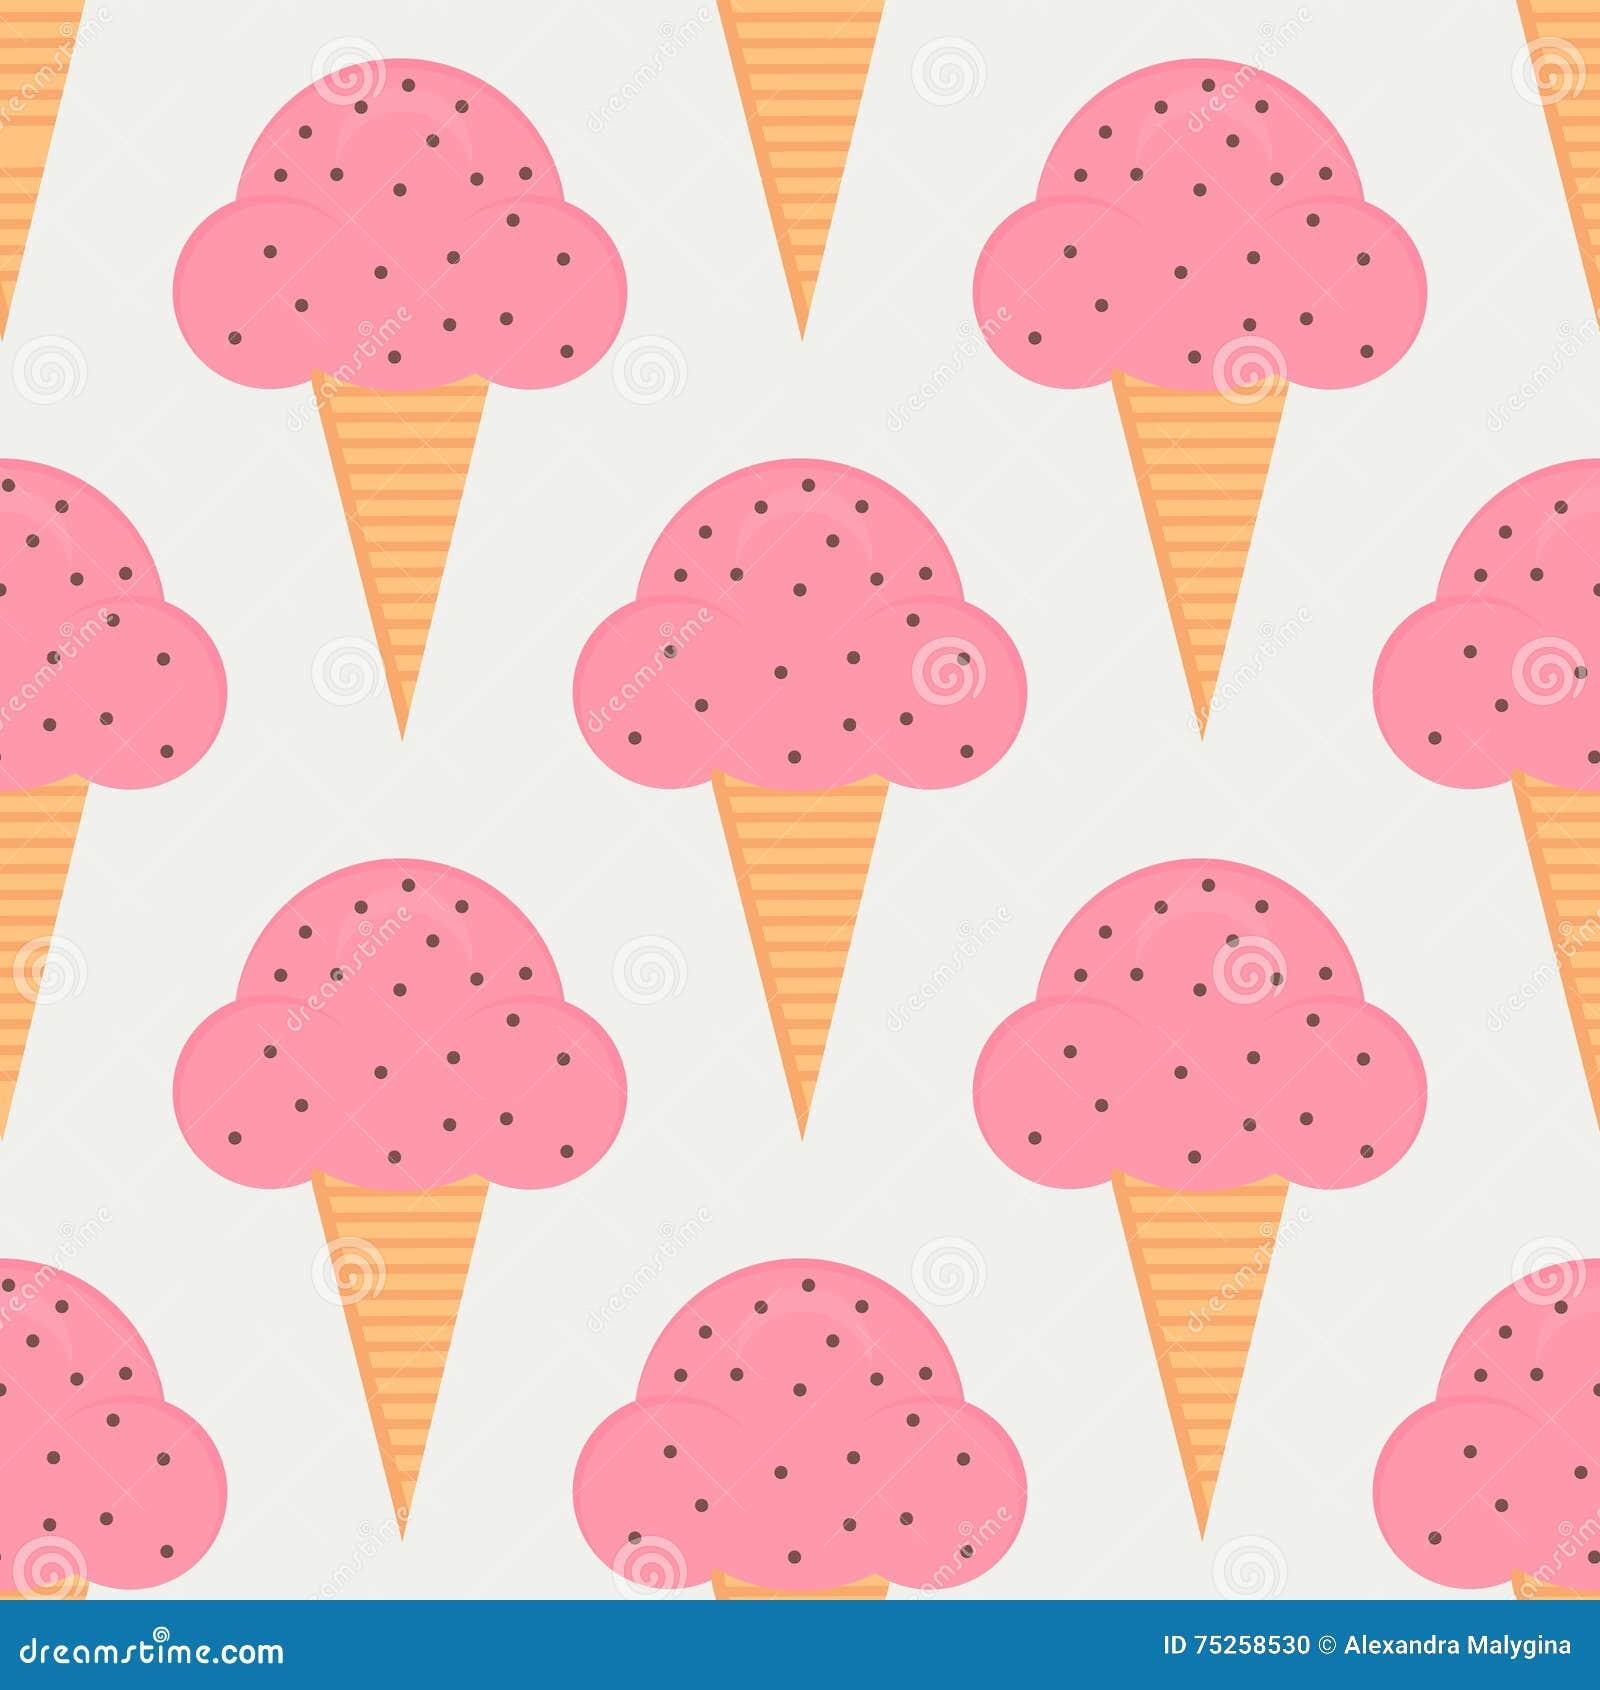 Ice Cream Cones Seamless Pattern Background Stock Vector: Ice Cream Seamless Pattern In Flat Style Stock Vector